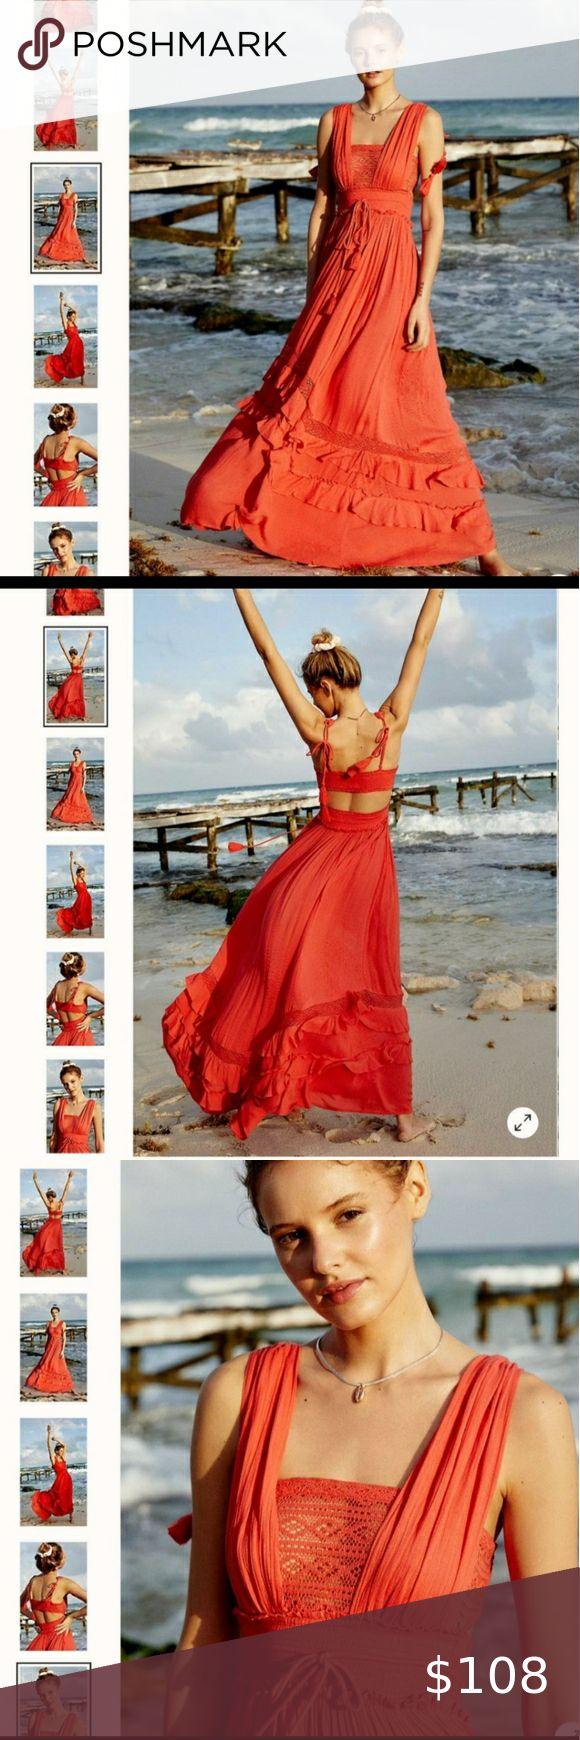 Free People Santa Maria Maxi Dress In 2020 Free People Maxi Dress Maxi Dress Dresses [ 1740 x 580 Pixel ]